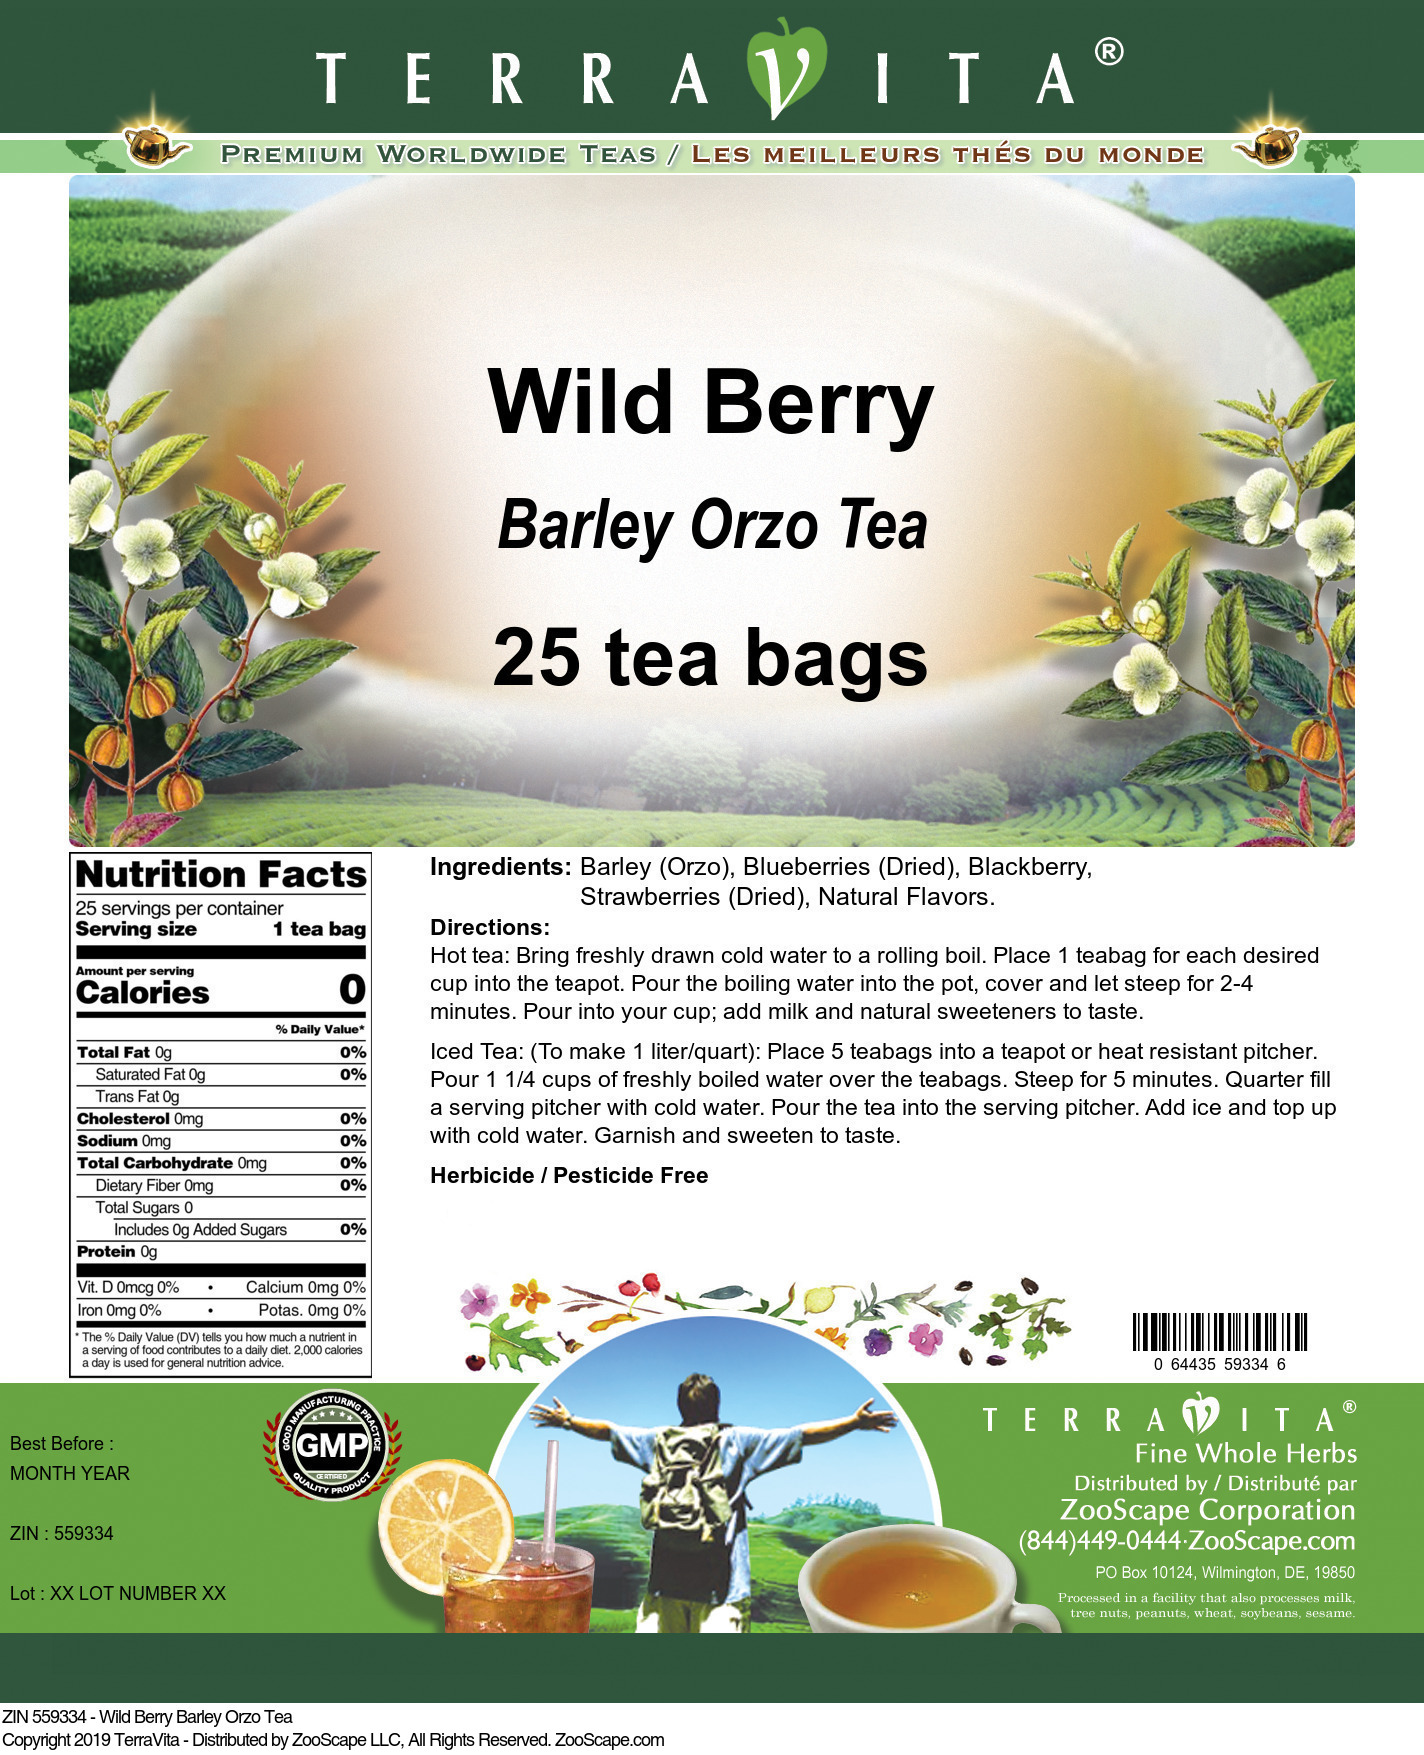 Wild Berry Barley Orzo Tea